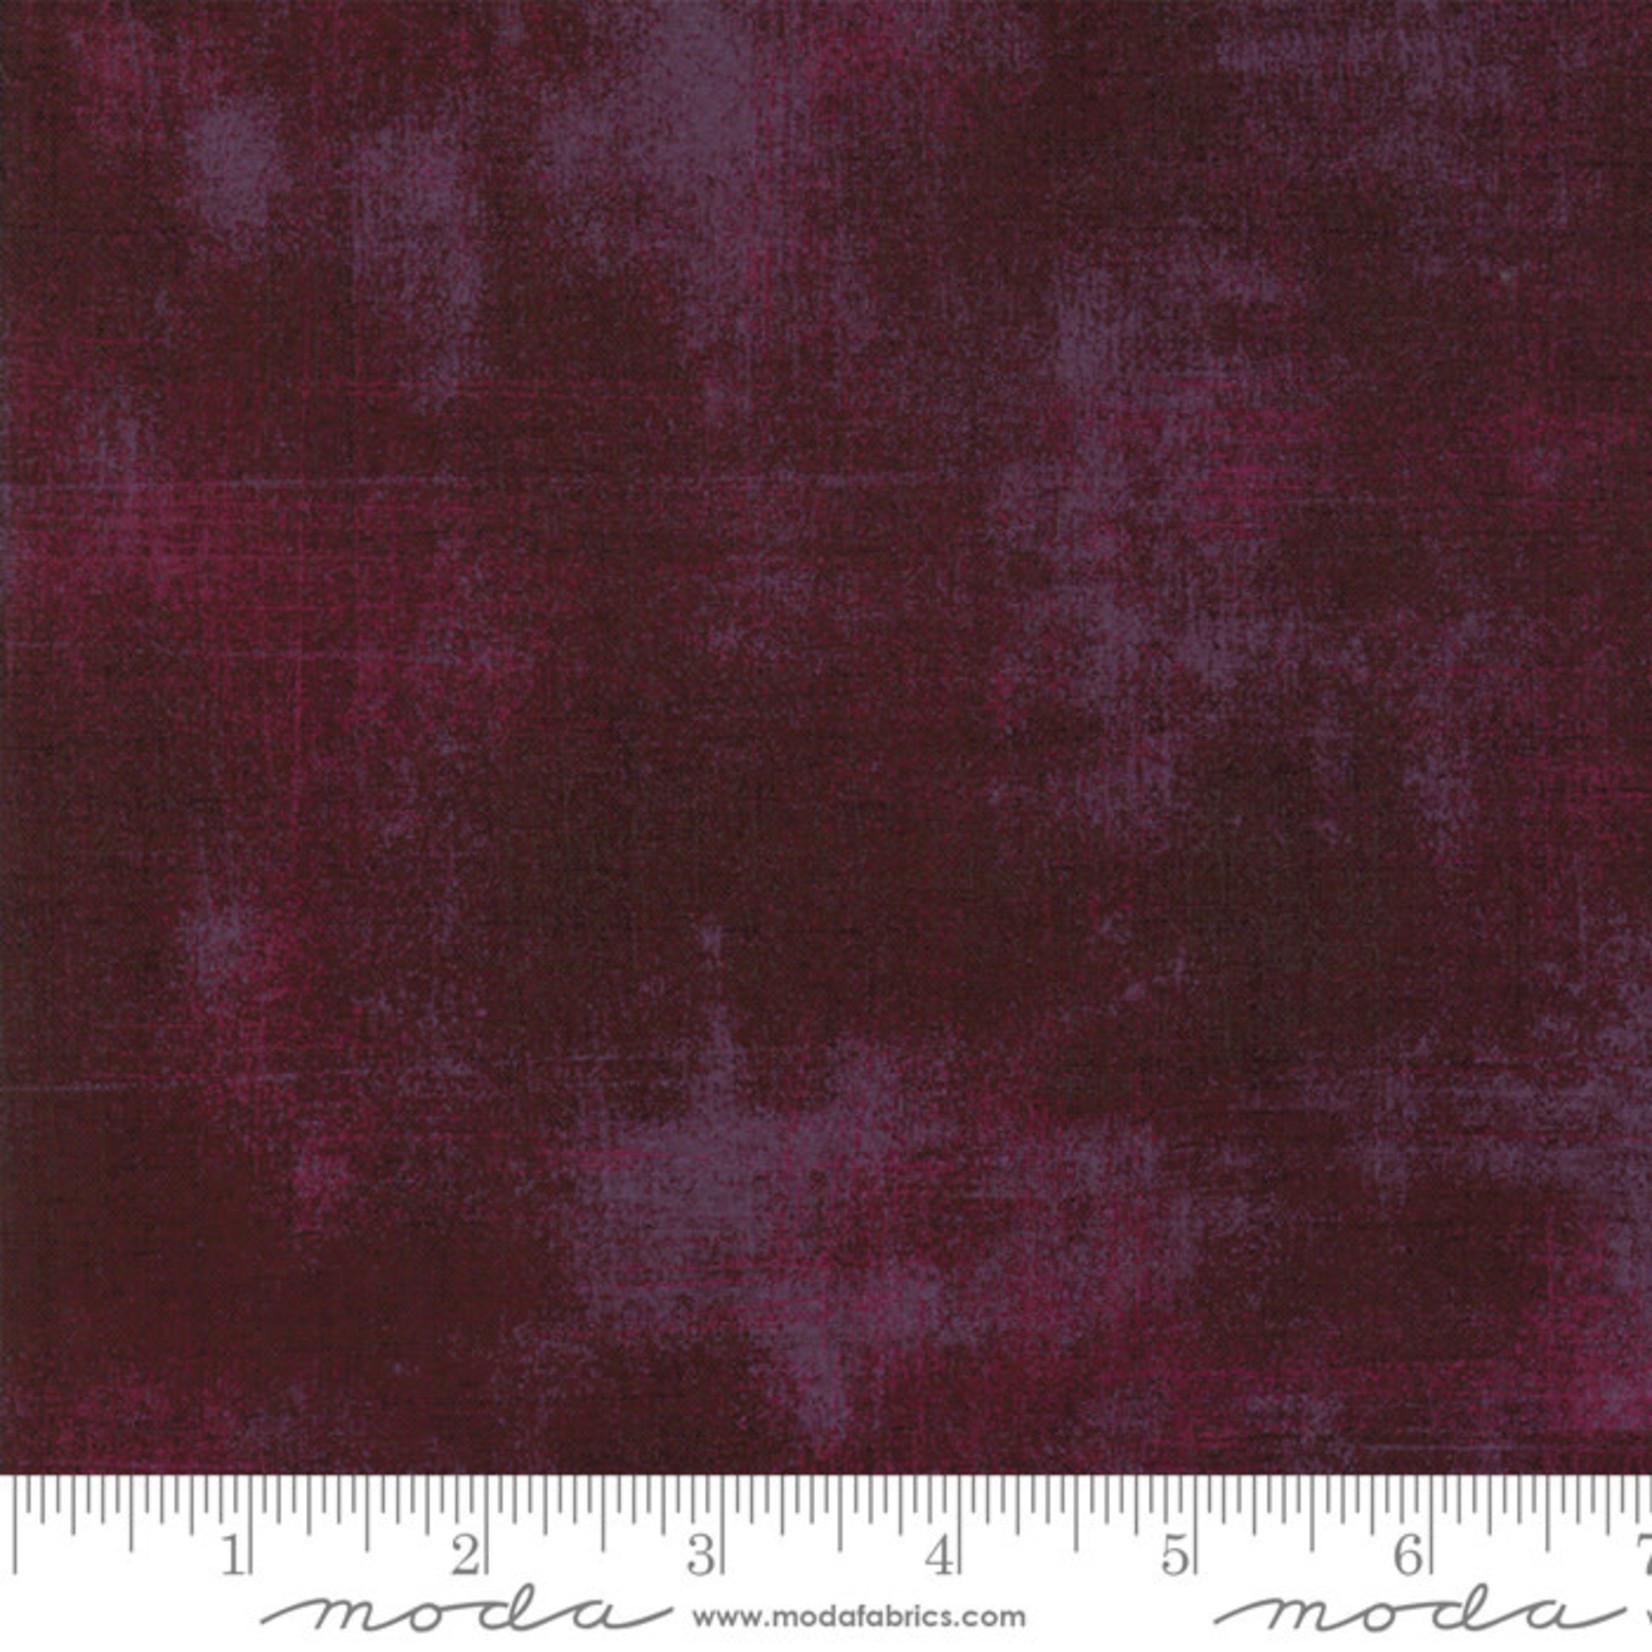 Moda GRUNGE BASICS Grunge - Fig per cm or $20/m